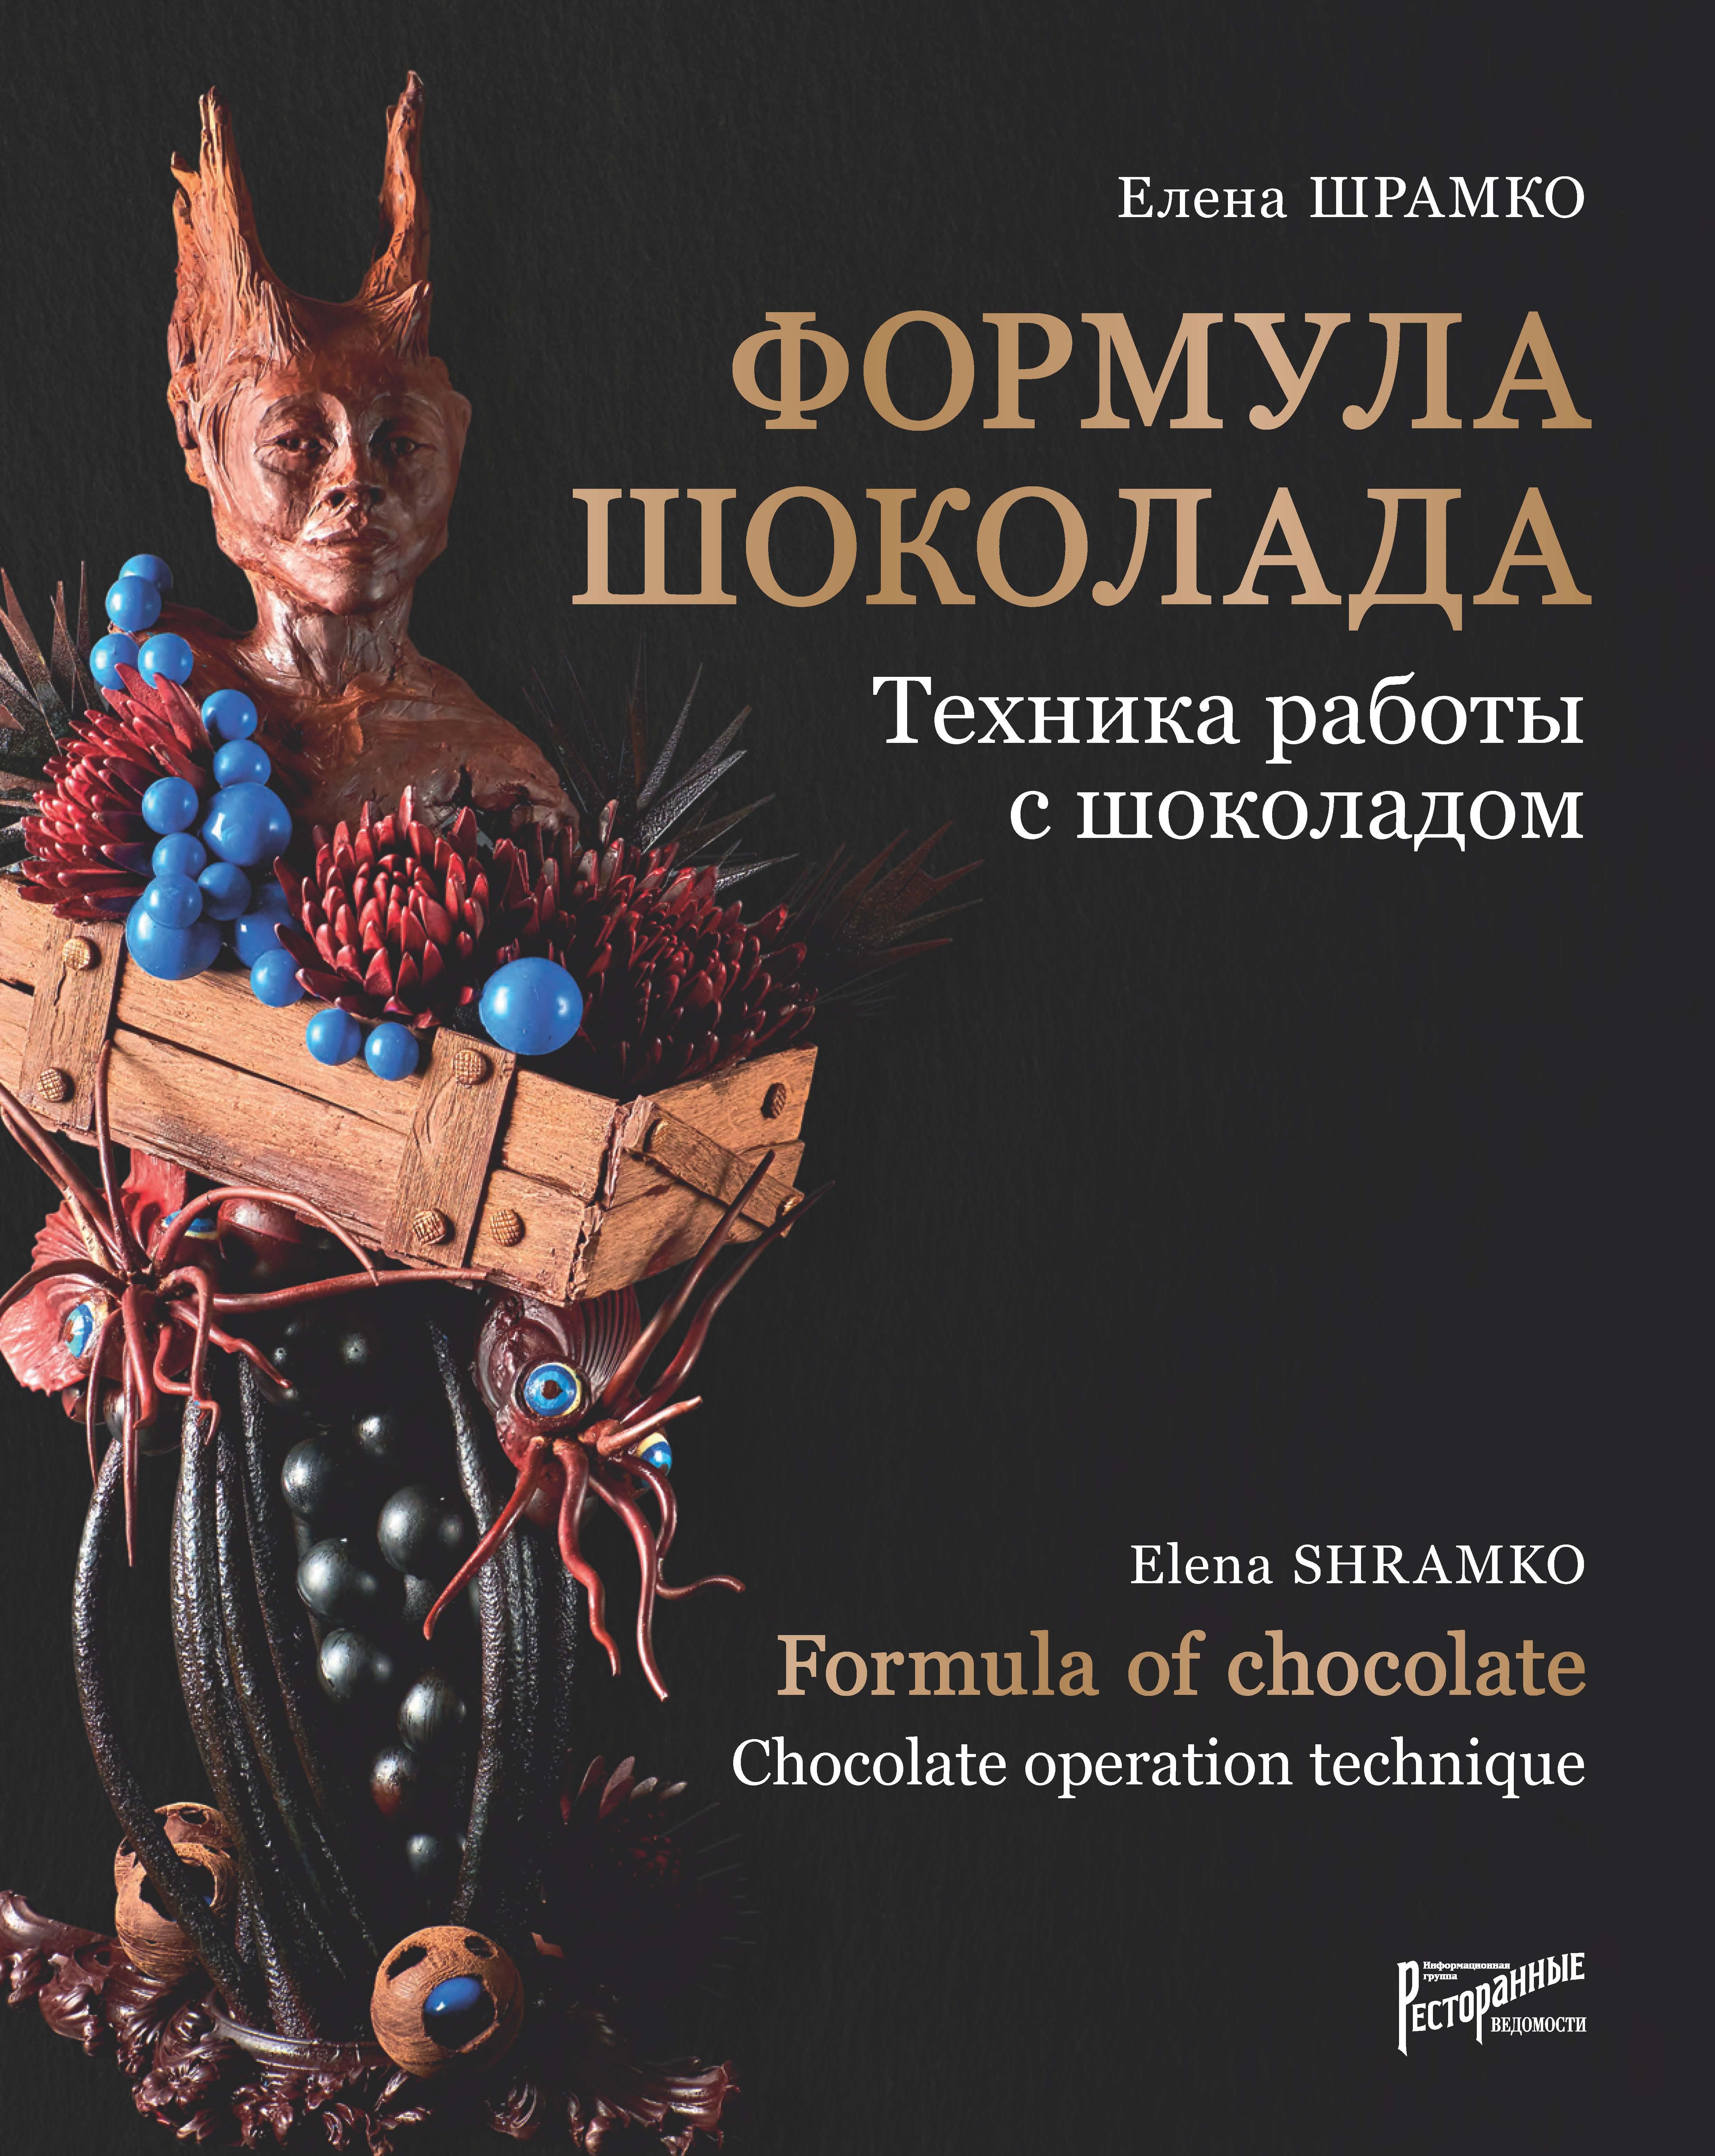 Елена Шрамко Формула шоколада. Техника работы с шоколадом чалова елена фонтан с шоколадом